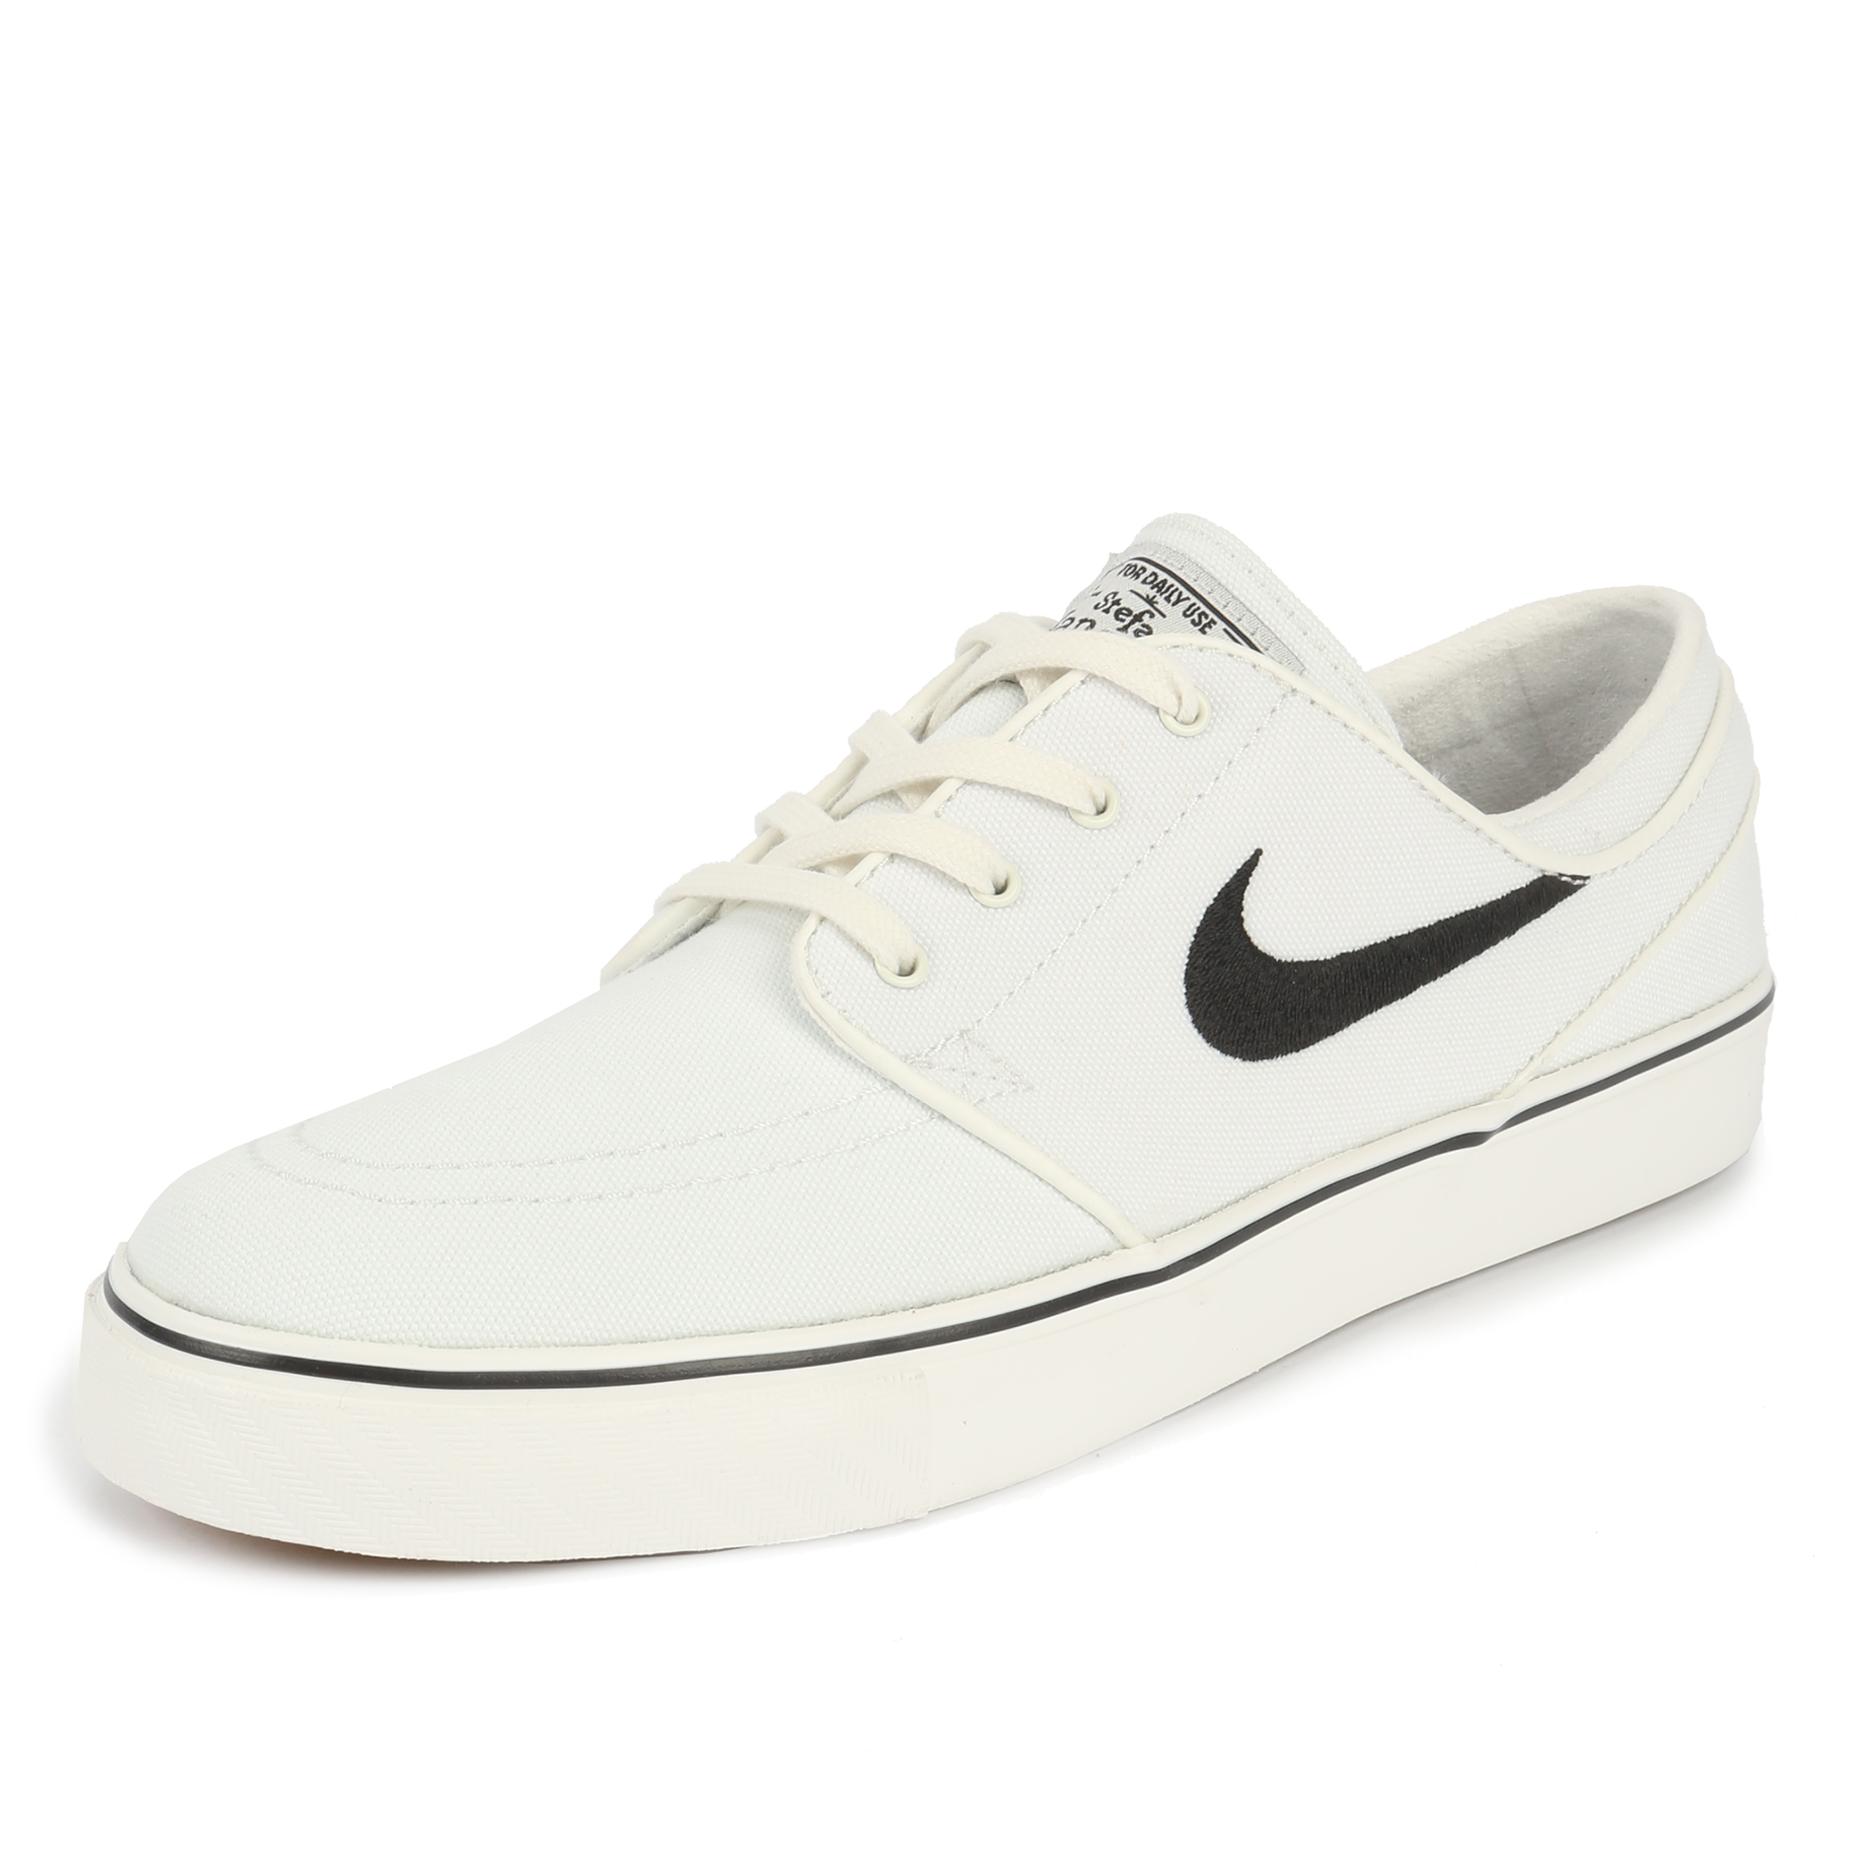 wholesale dealer ceaf4 bb320 Кеды Nike SB Zoom Stefan Janoski Canvas Белый - фото 2